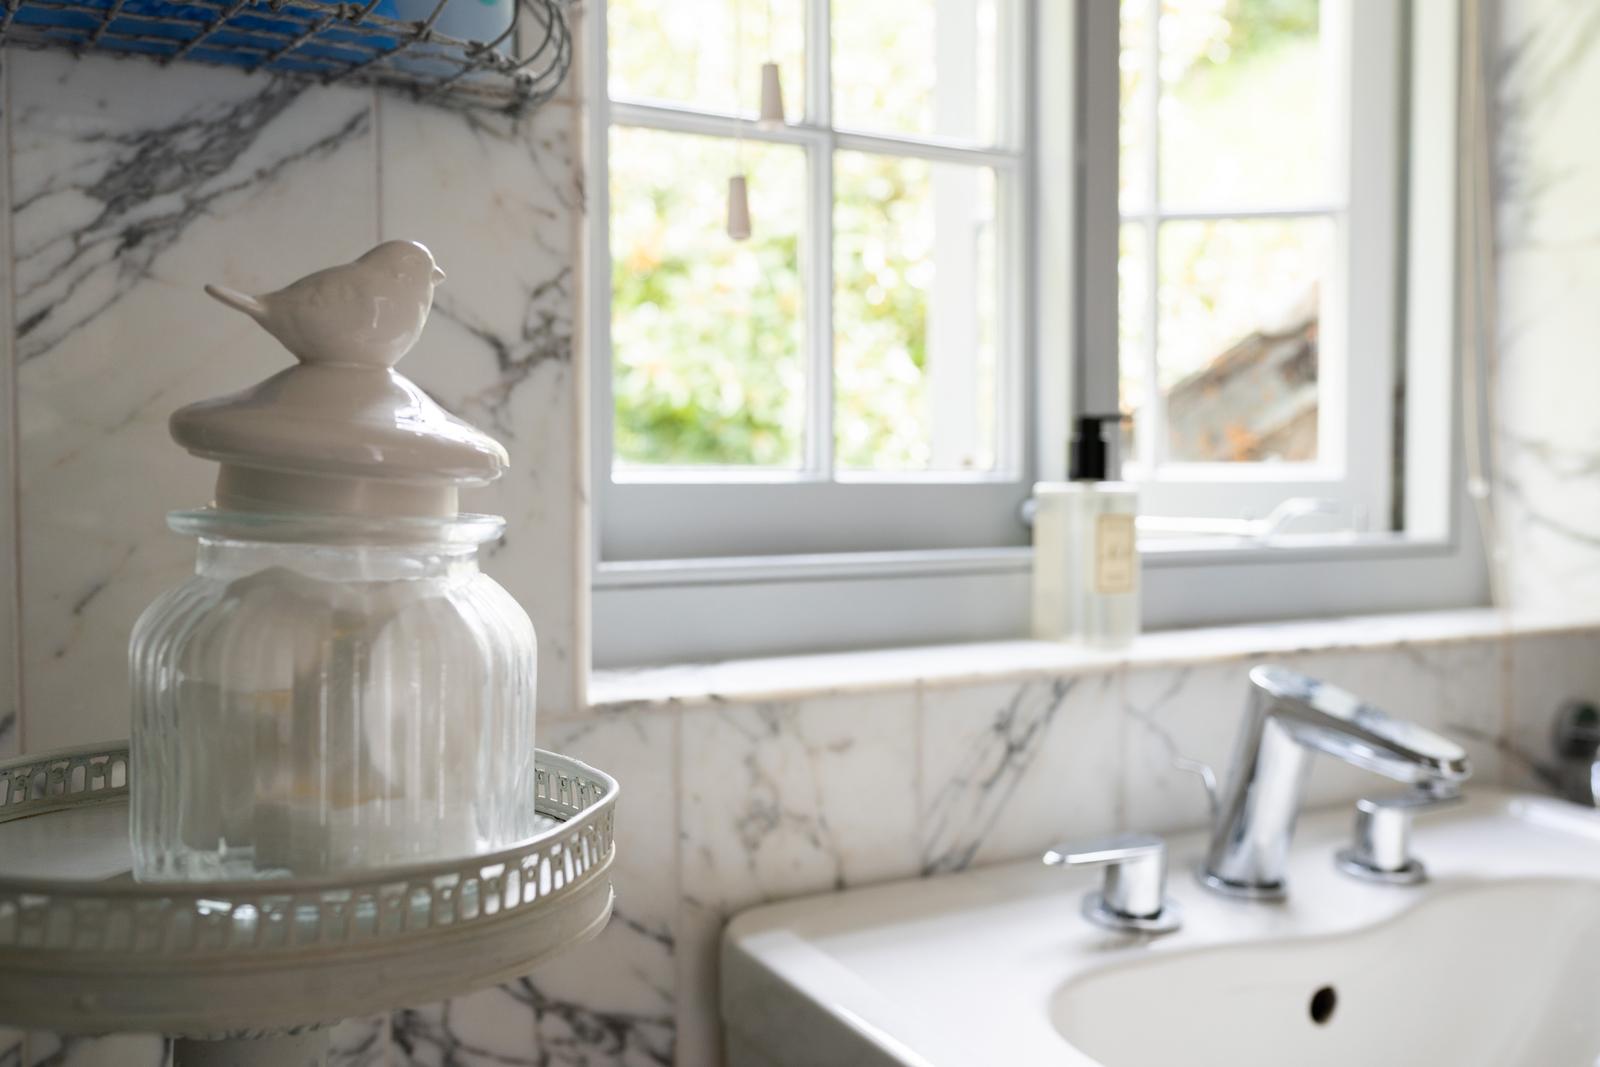 Shower room: basin